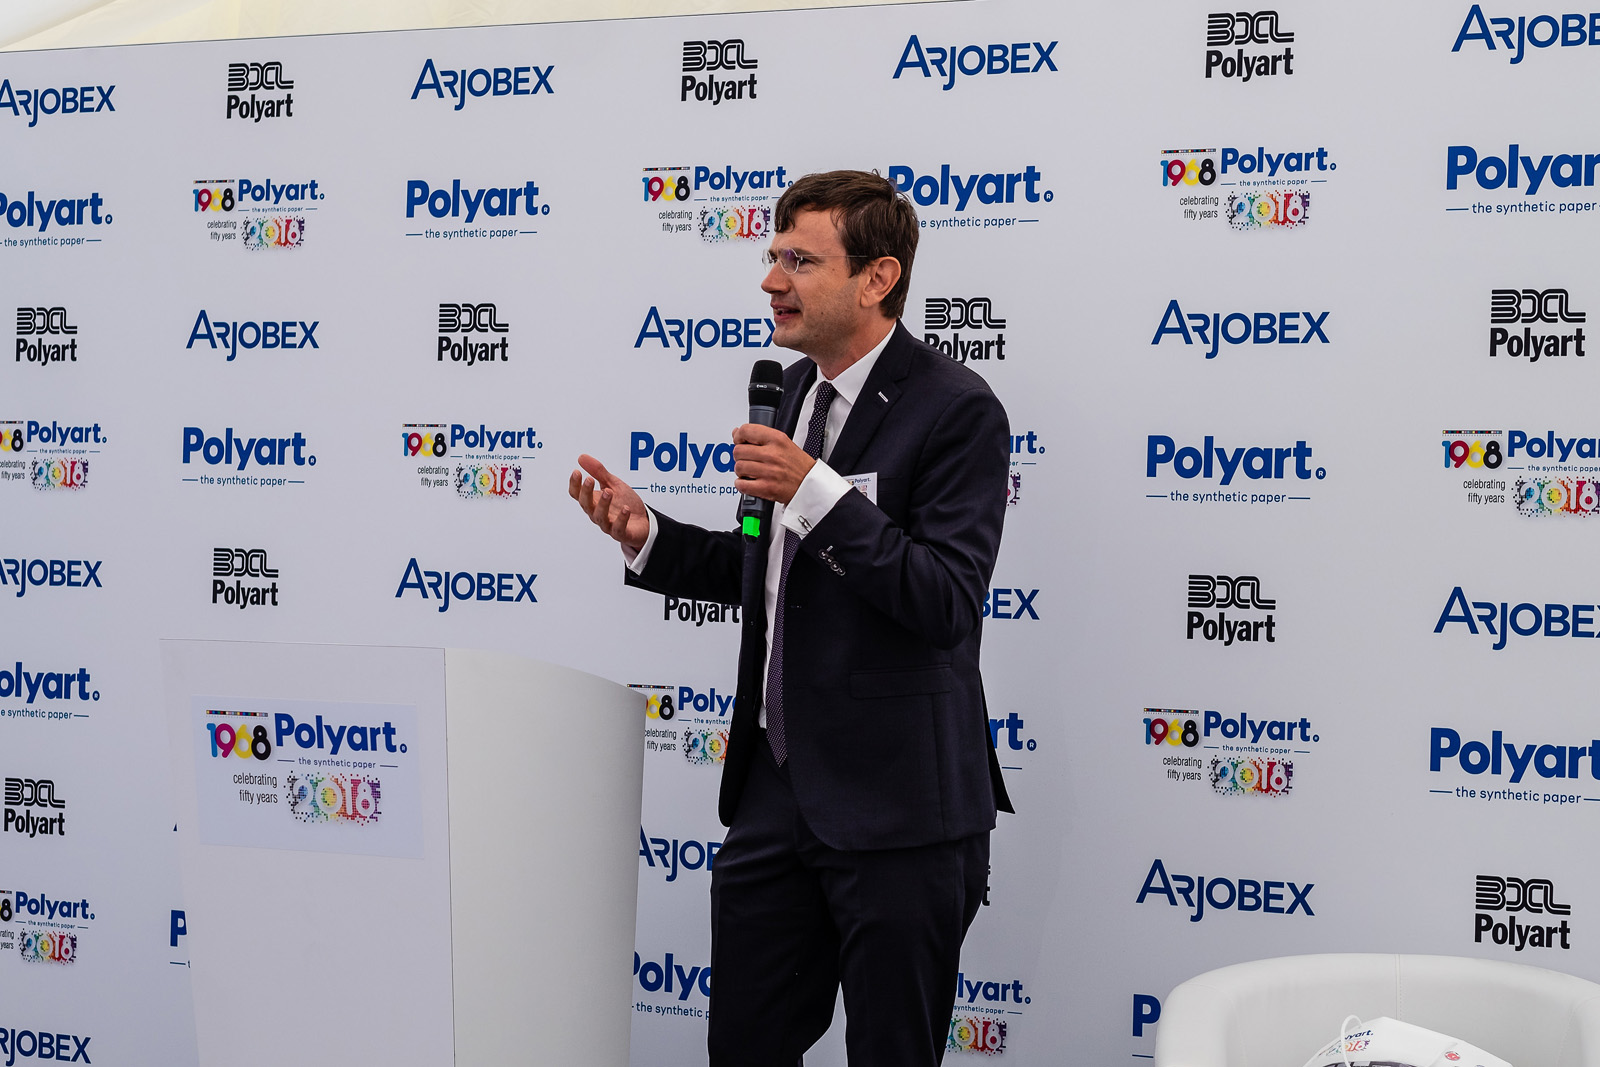 Polyart - Arjobex celebrates 50th anniversary